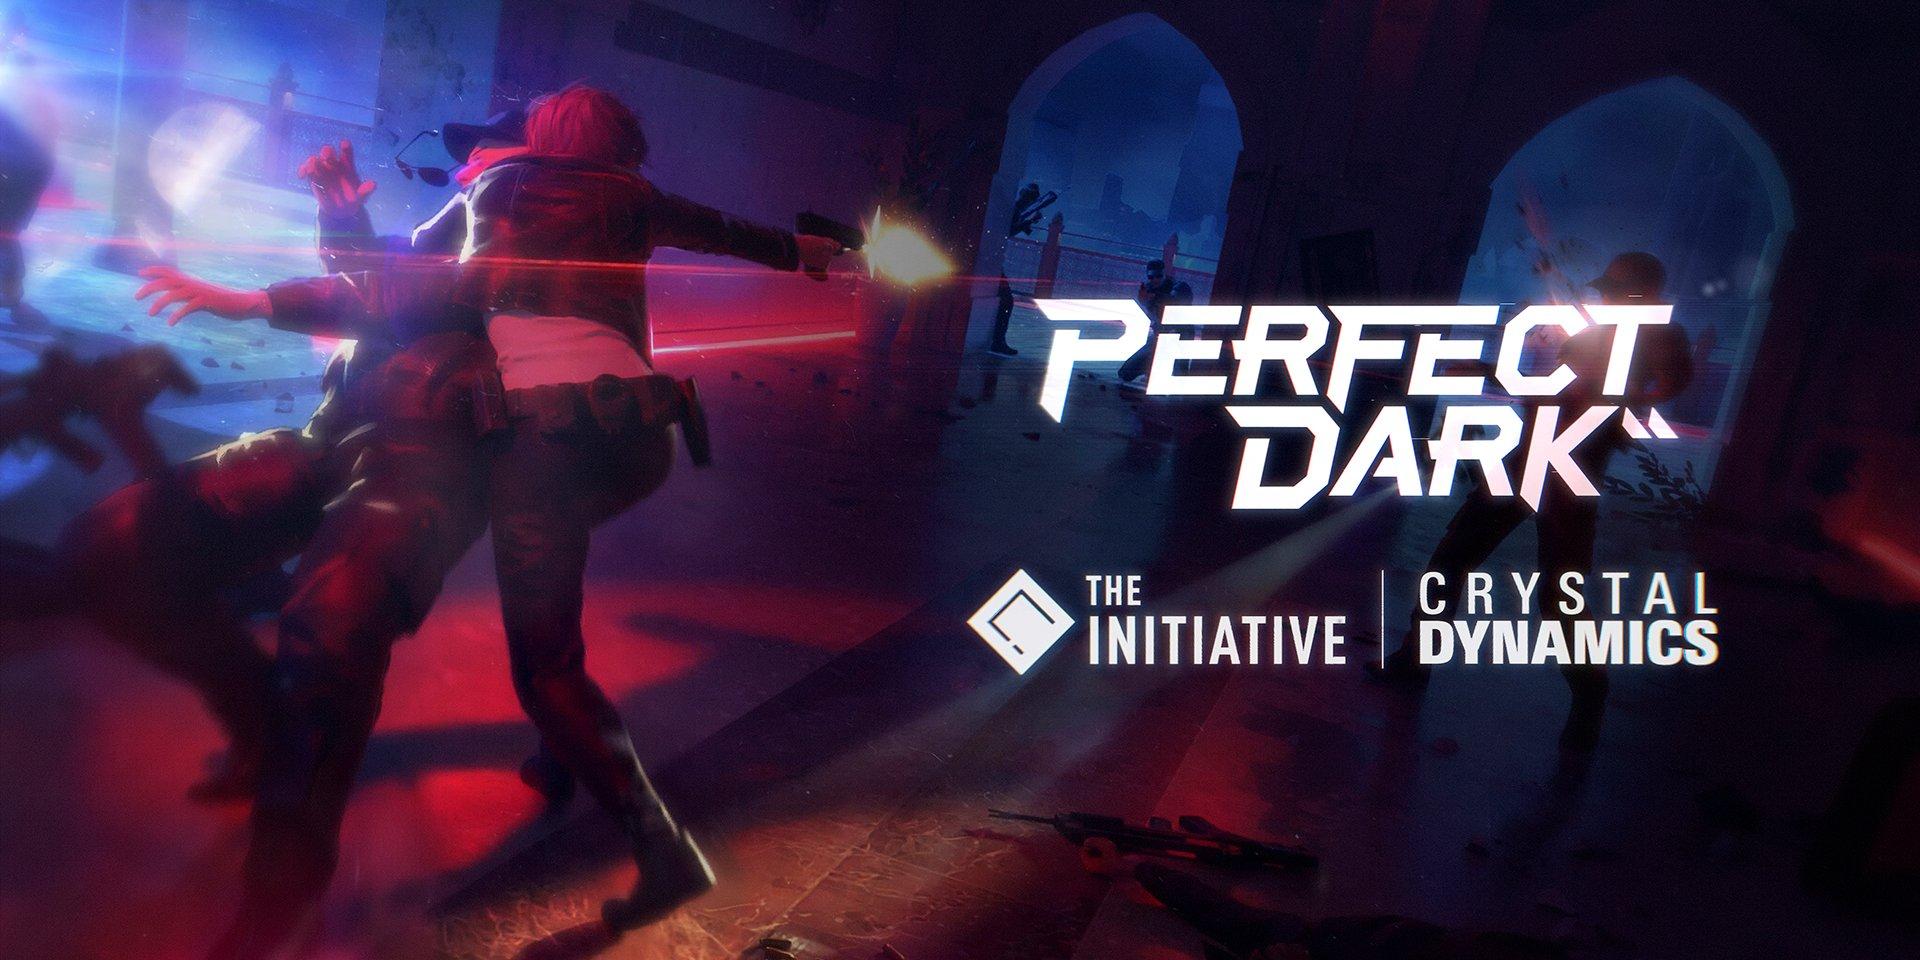 Почему The Initiative привлекла к разработке Perfect Dark студию Crystal Dynamics